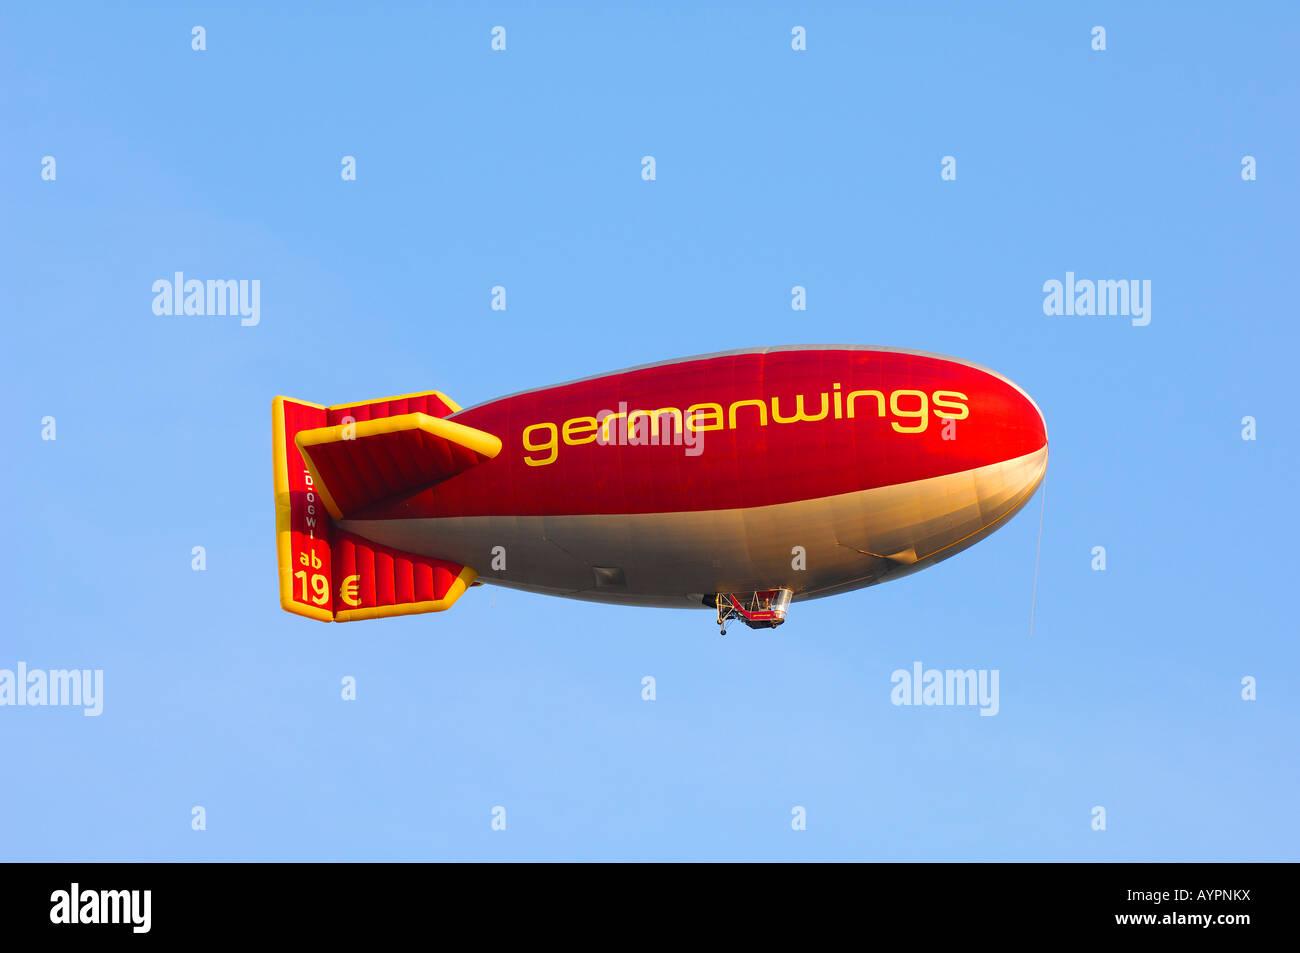 Germanwings logo on a blimp - Stock Image